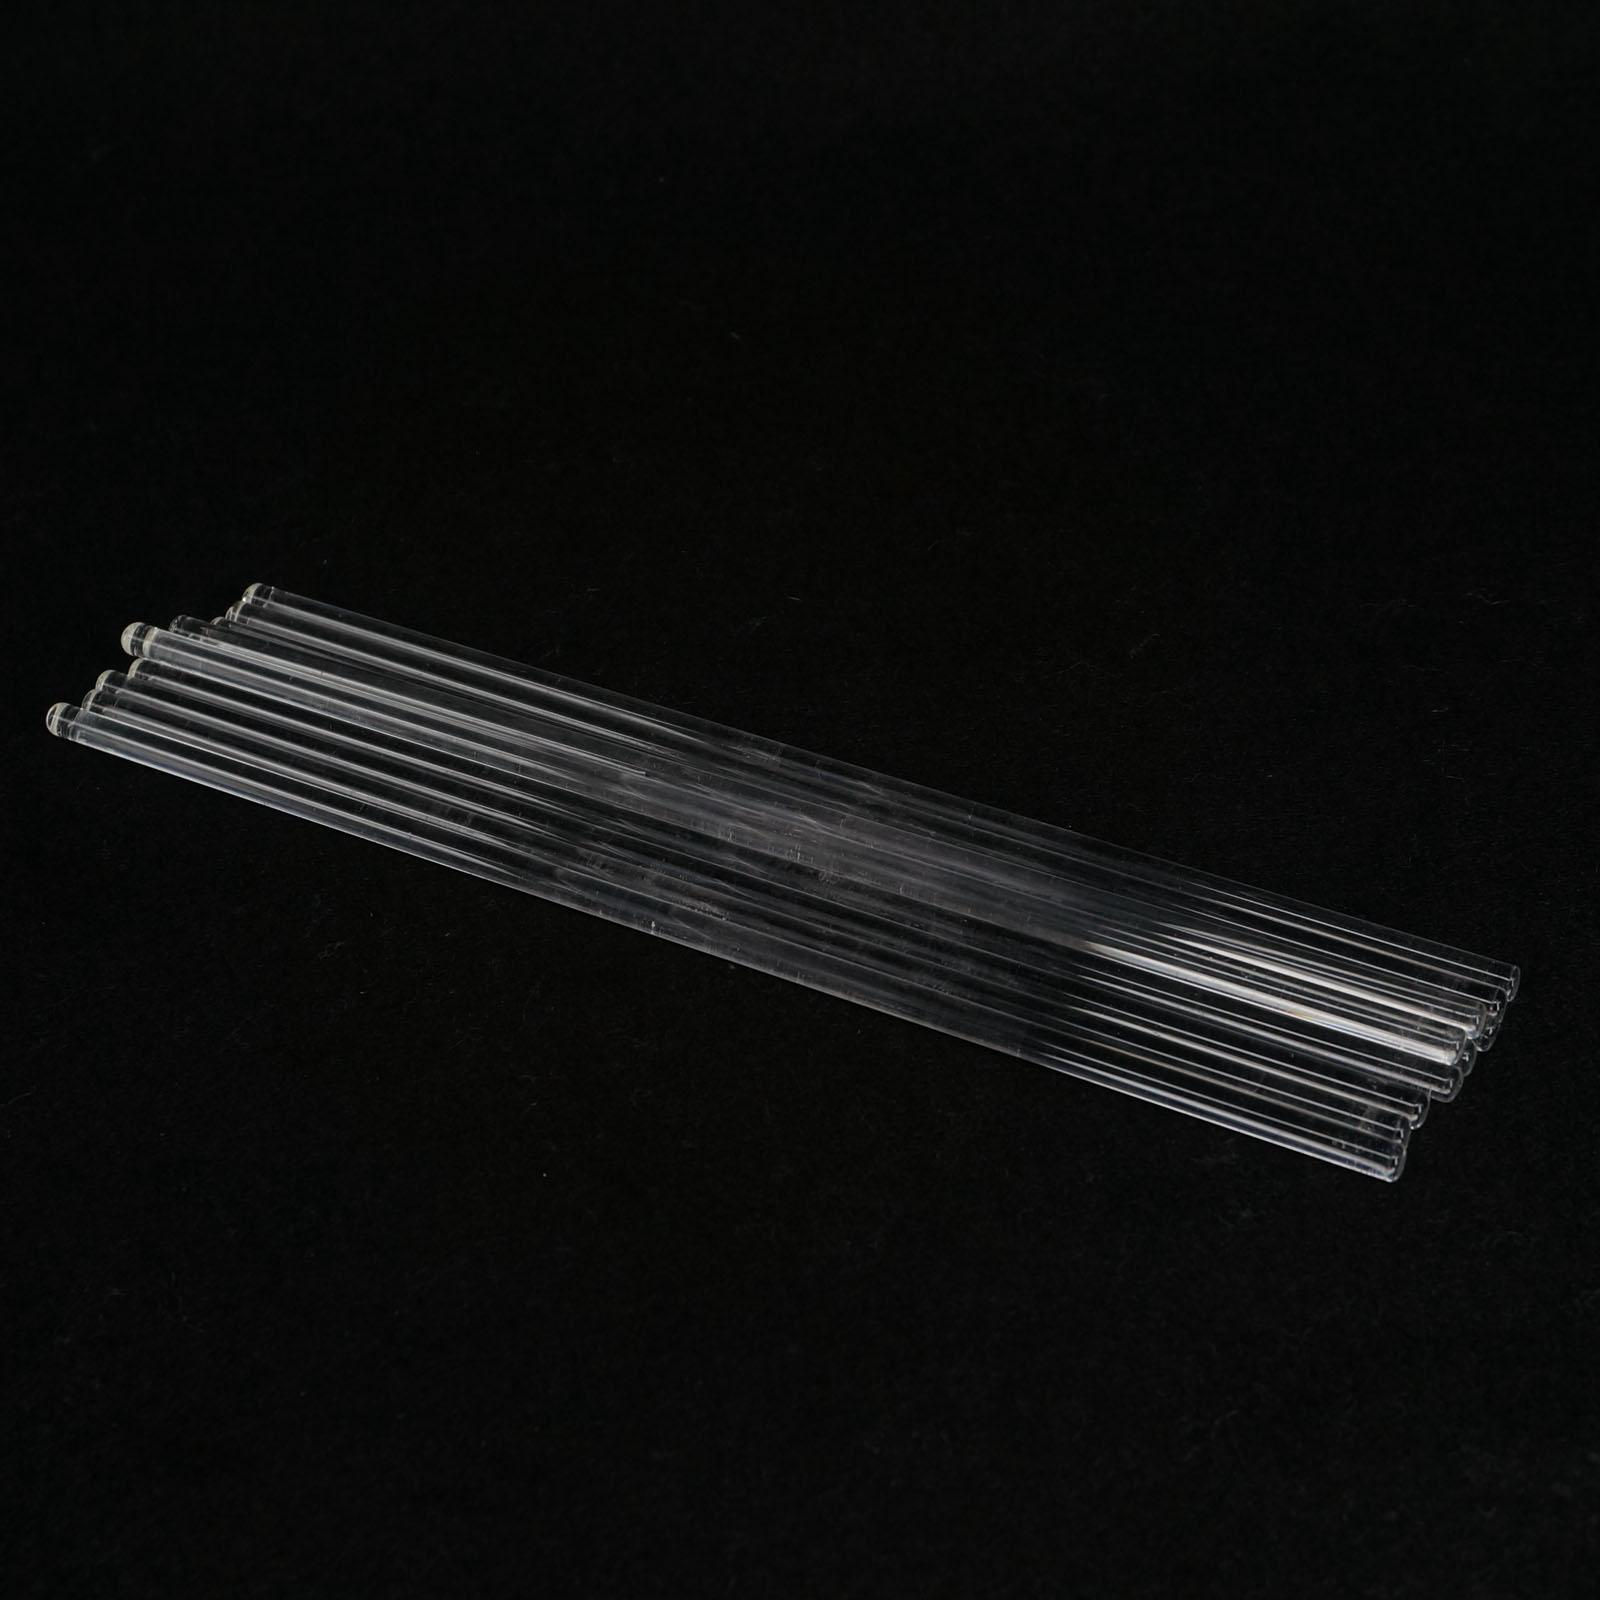 LOT10 6x200mm Lab Glass Stirring Rods Borosilicate High Resistant Stirrer